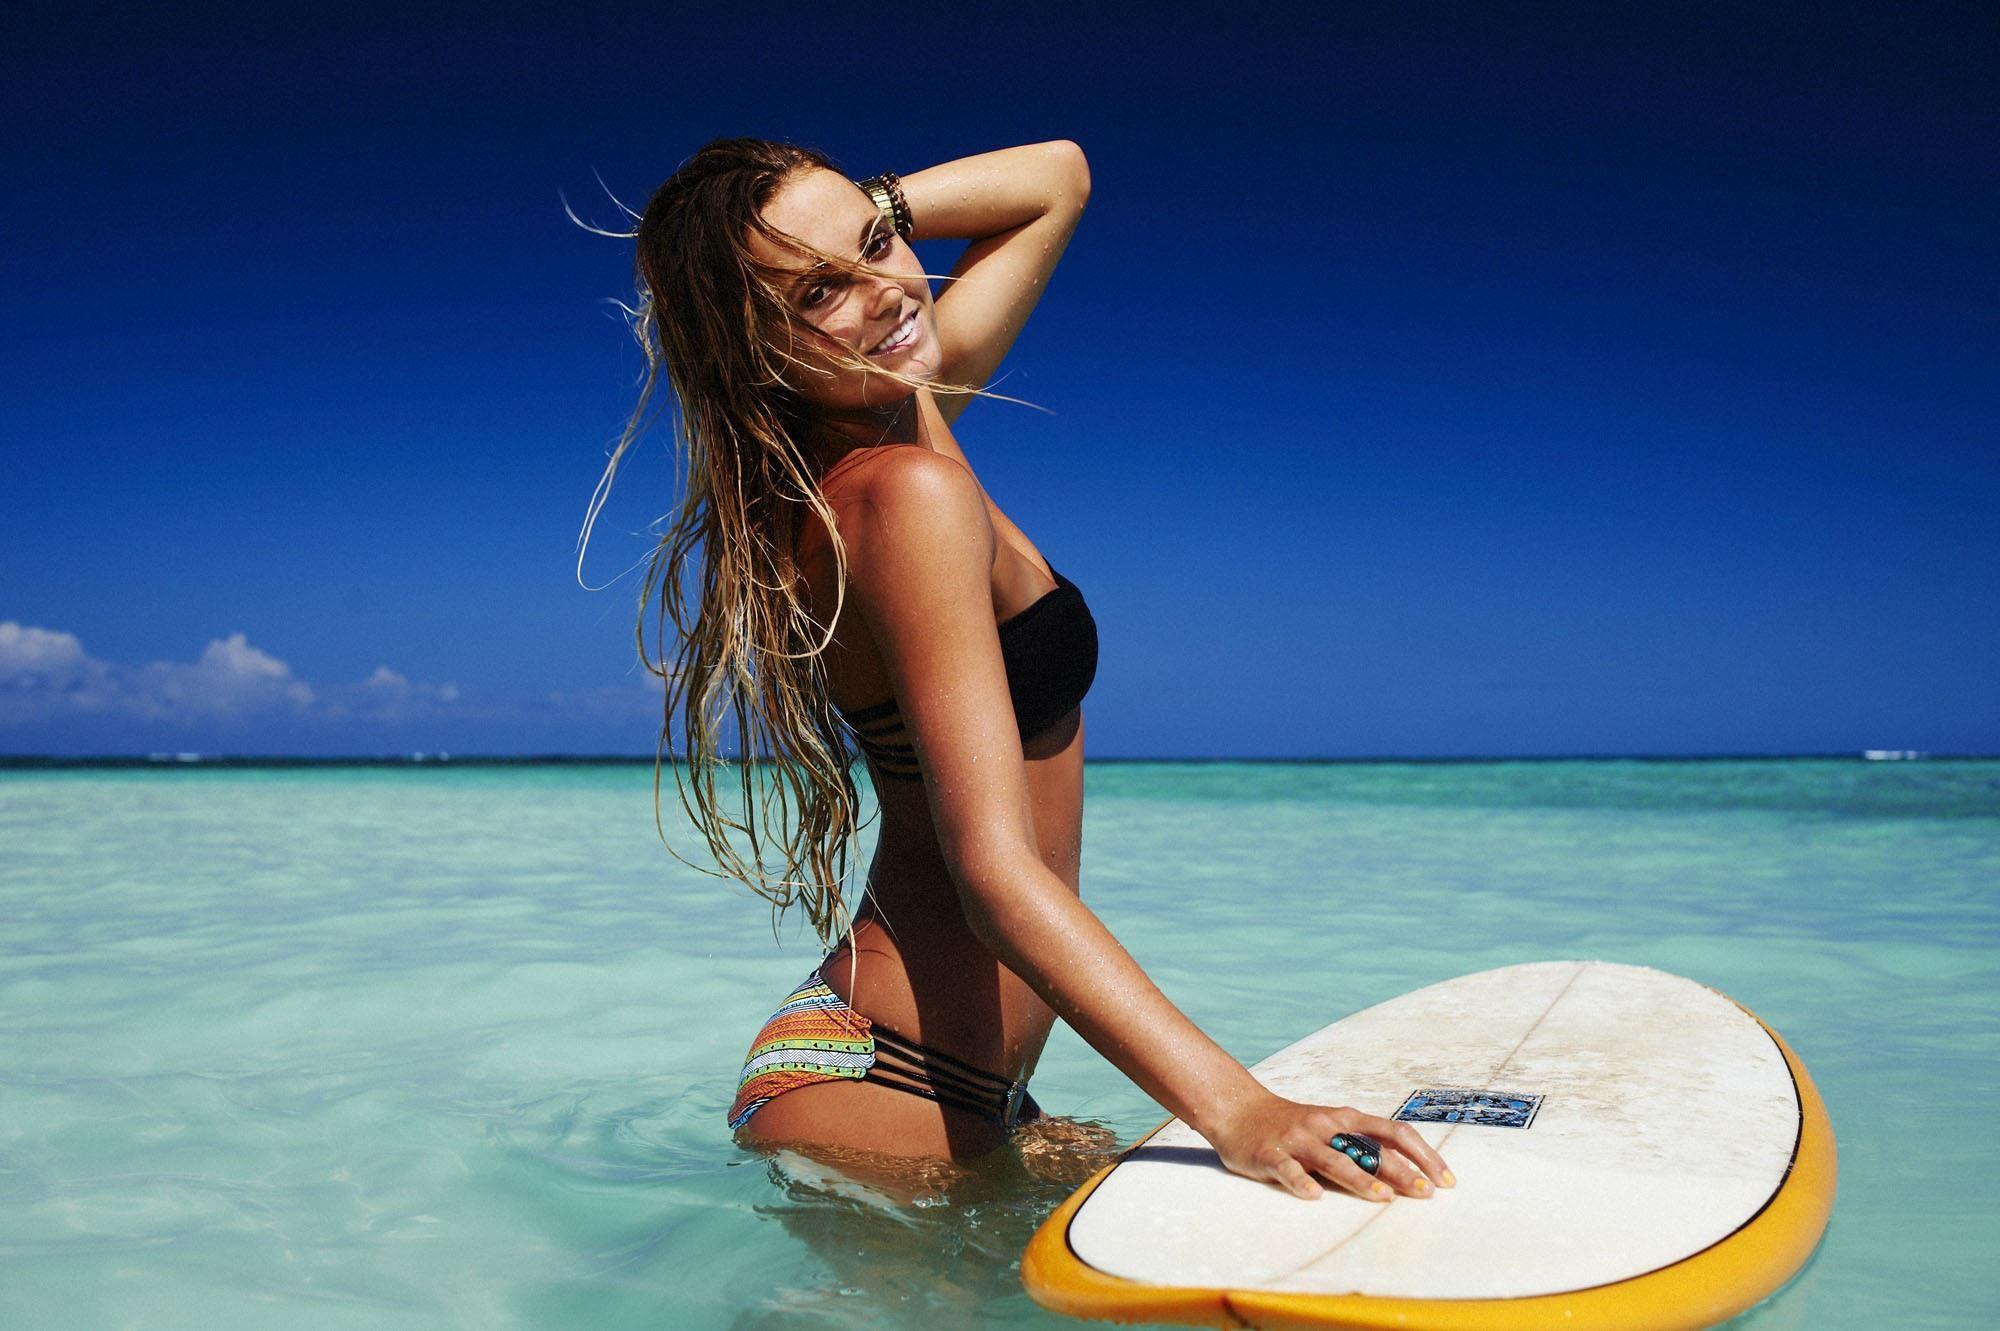 Hot surfing girl wallpaper HD.